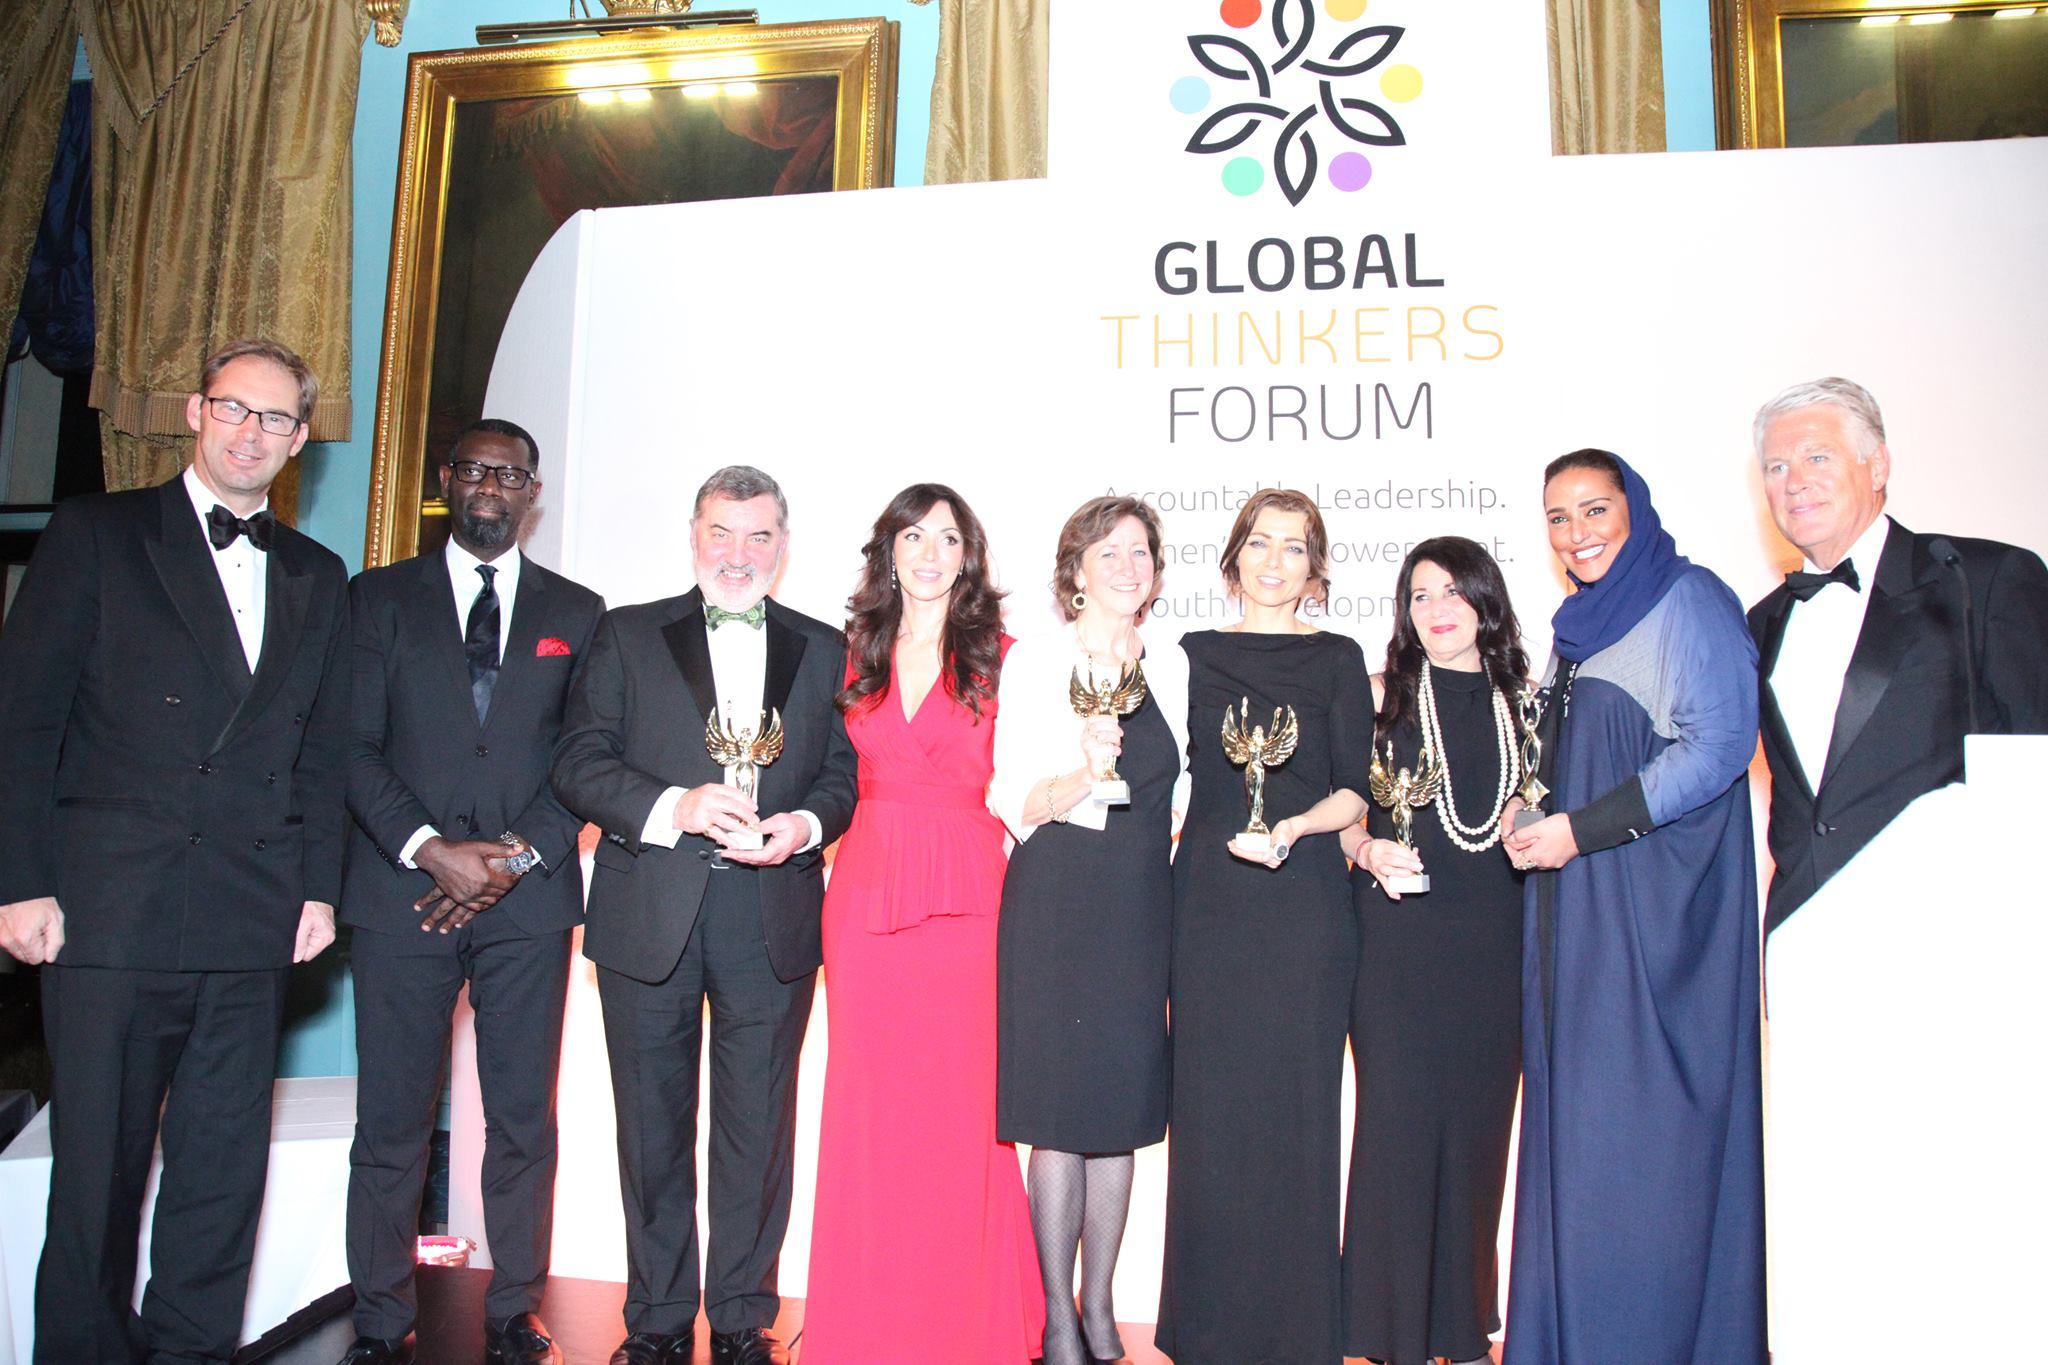 Global Thinkers Forum (GTF)